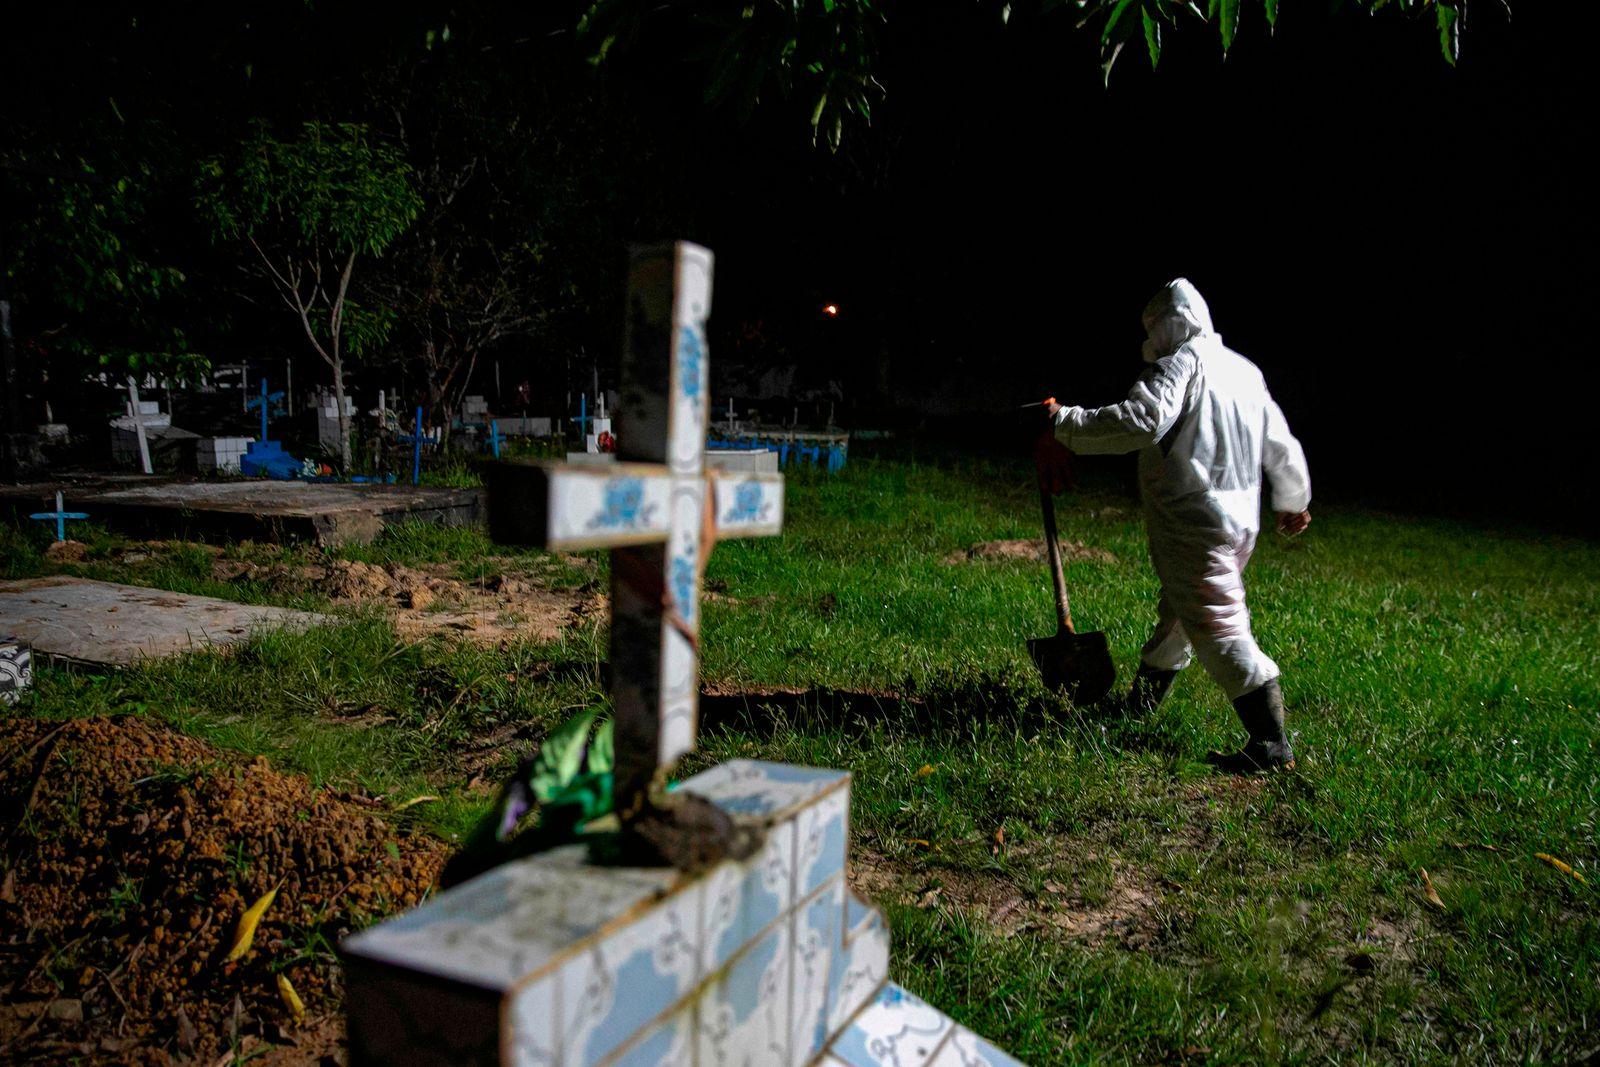 BRAZIL-HEALTH-VIRUS-MARAJO ISLAND-BURIAL